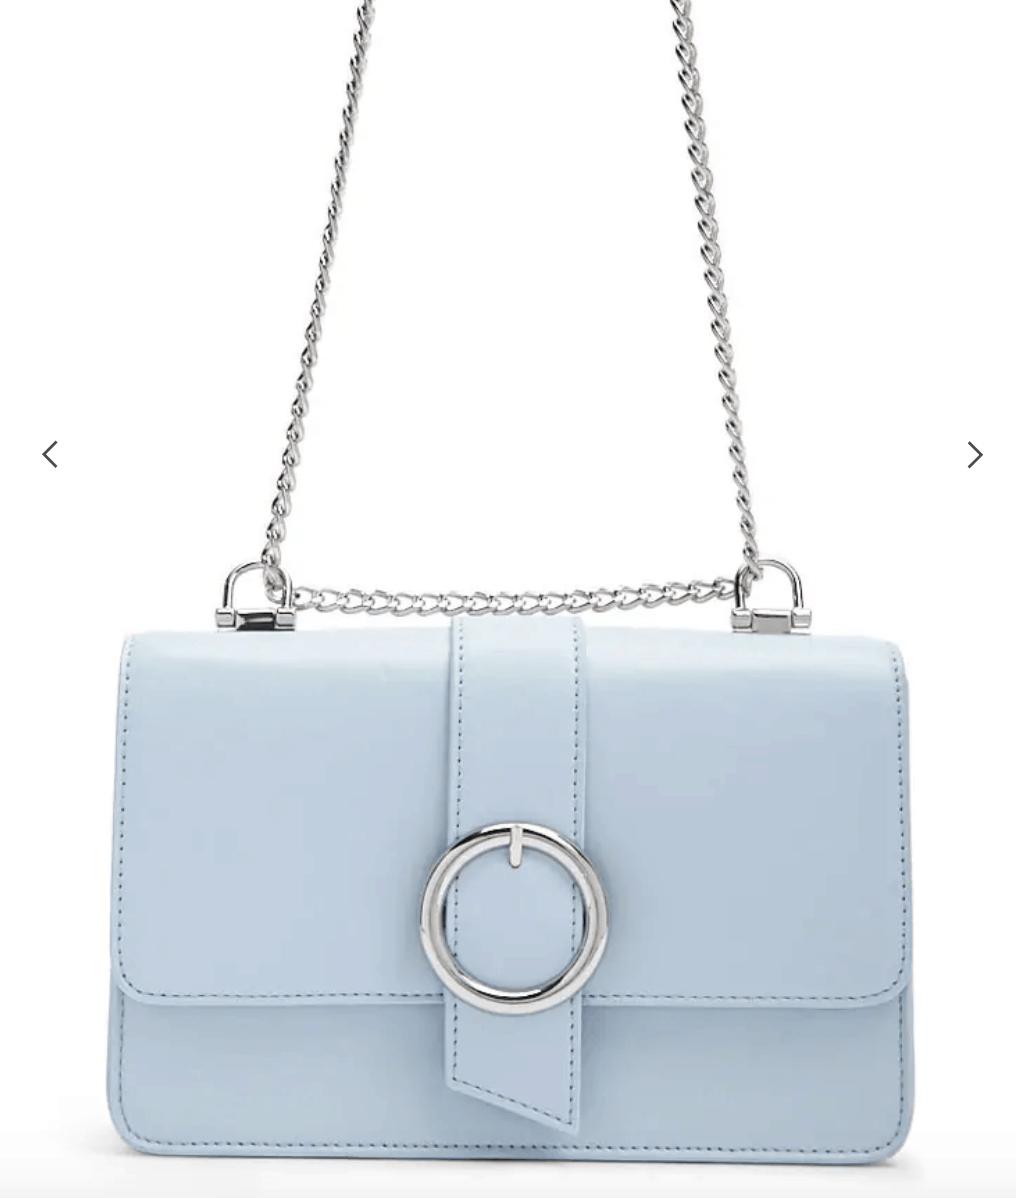 Faux Leather Crossbody handbag